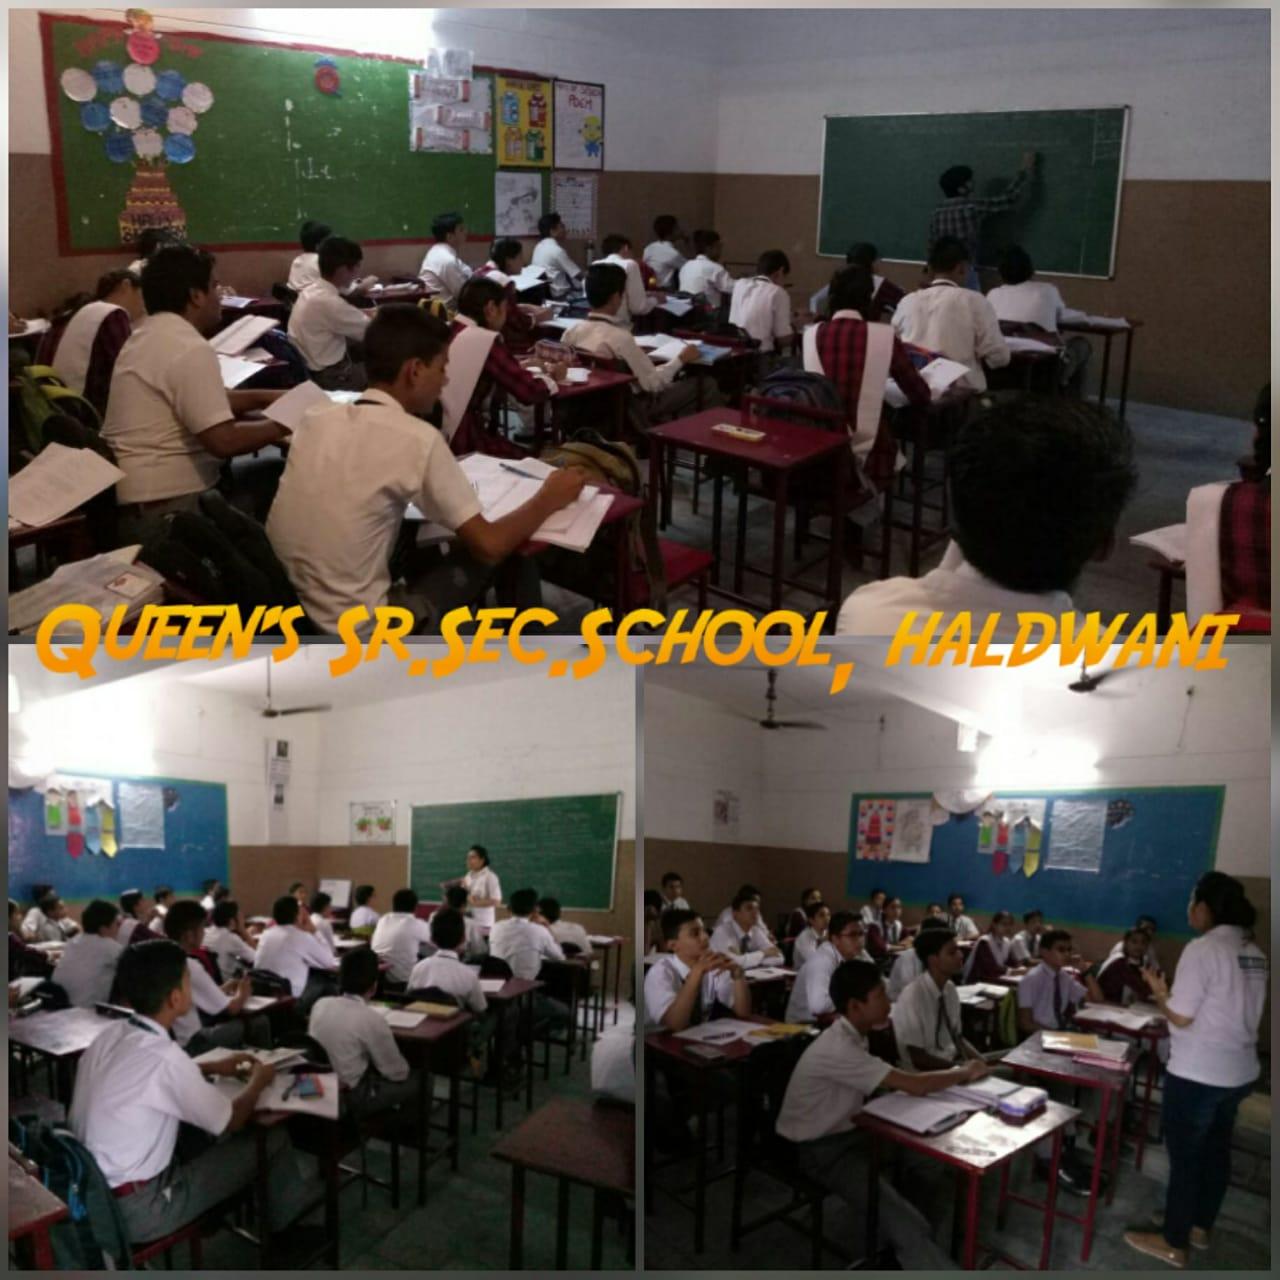 Queens Sr Sec school, HALDWANI.jpeg